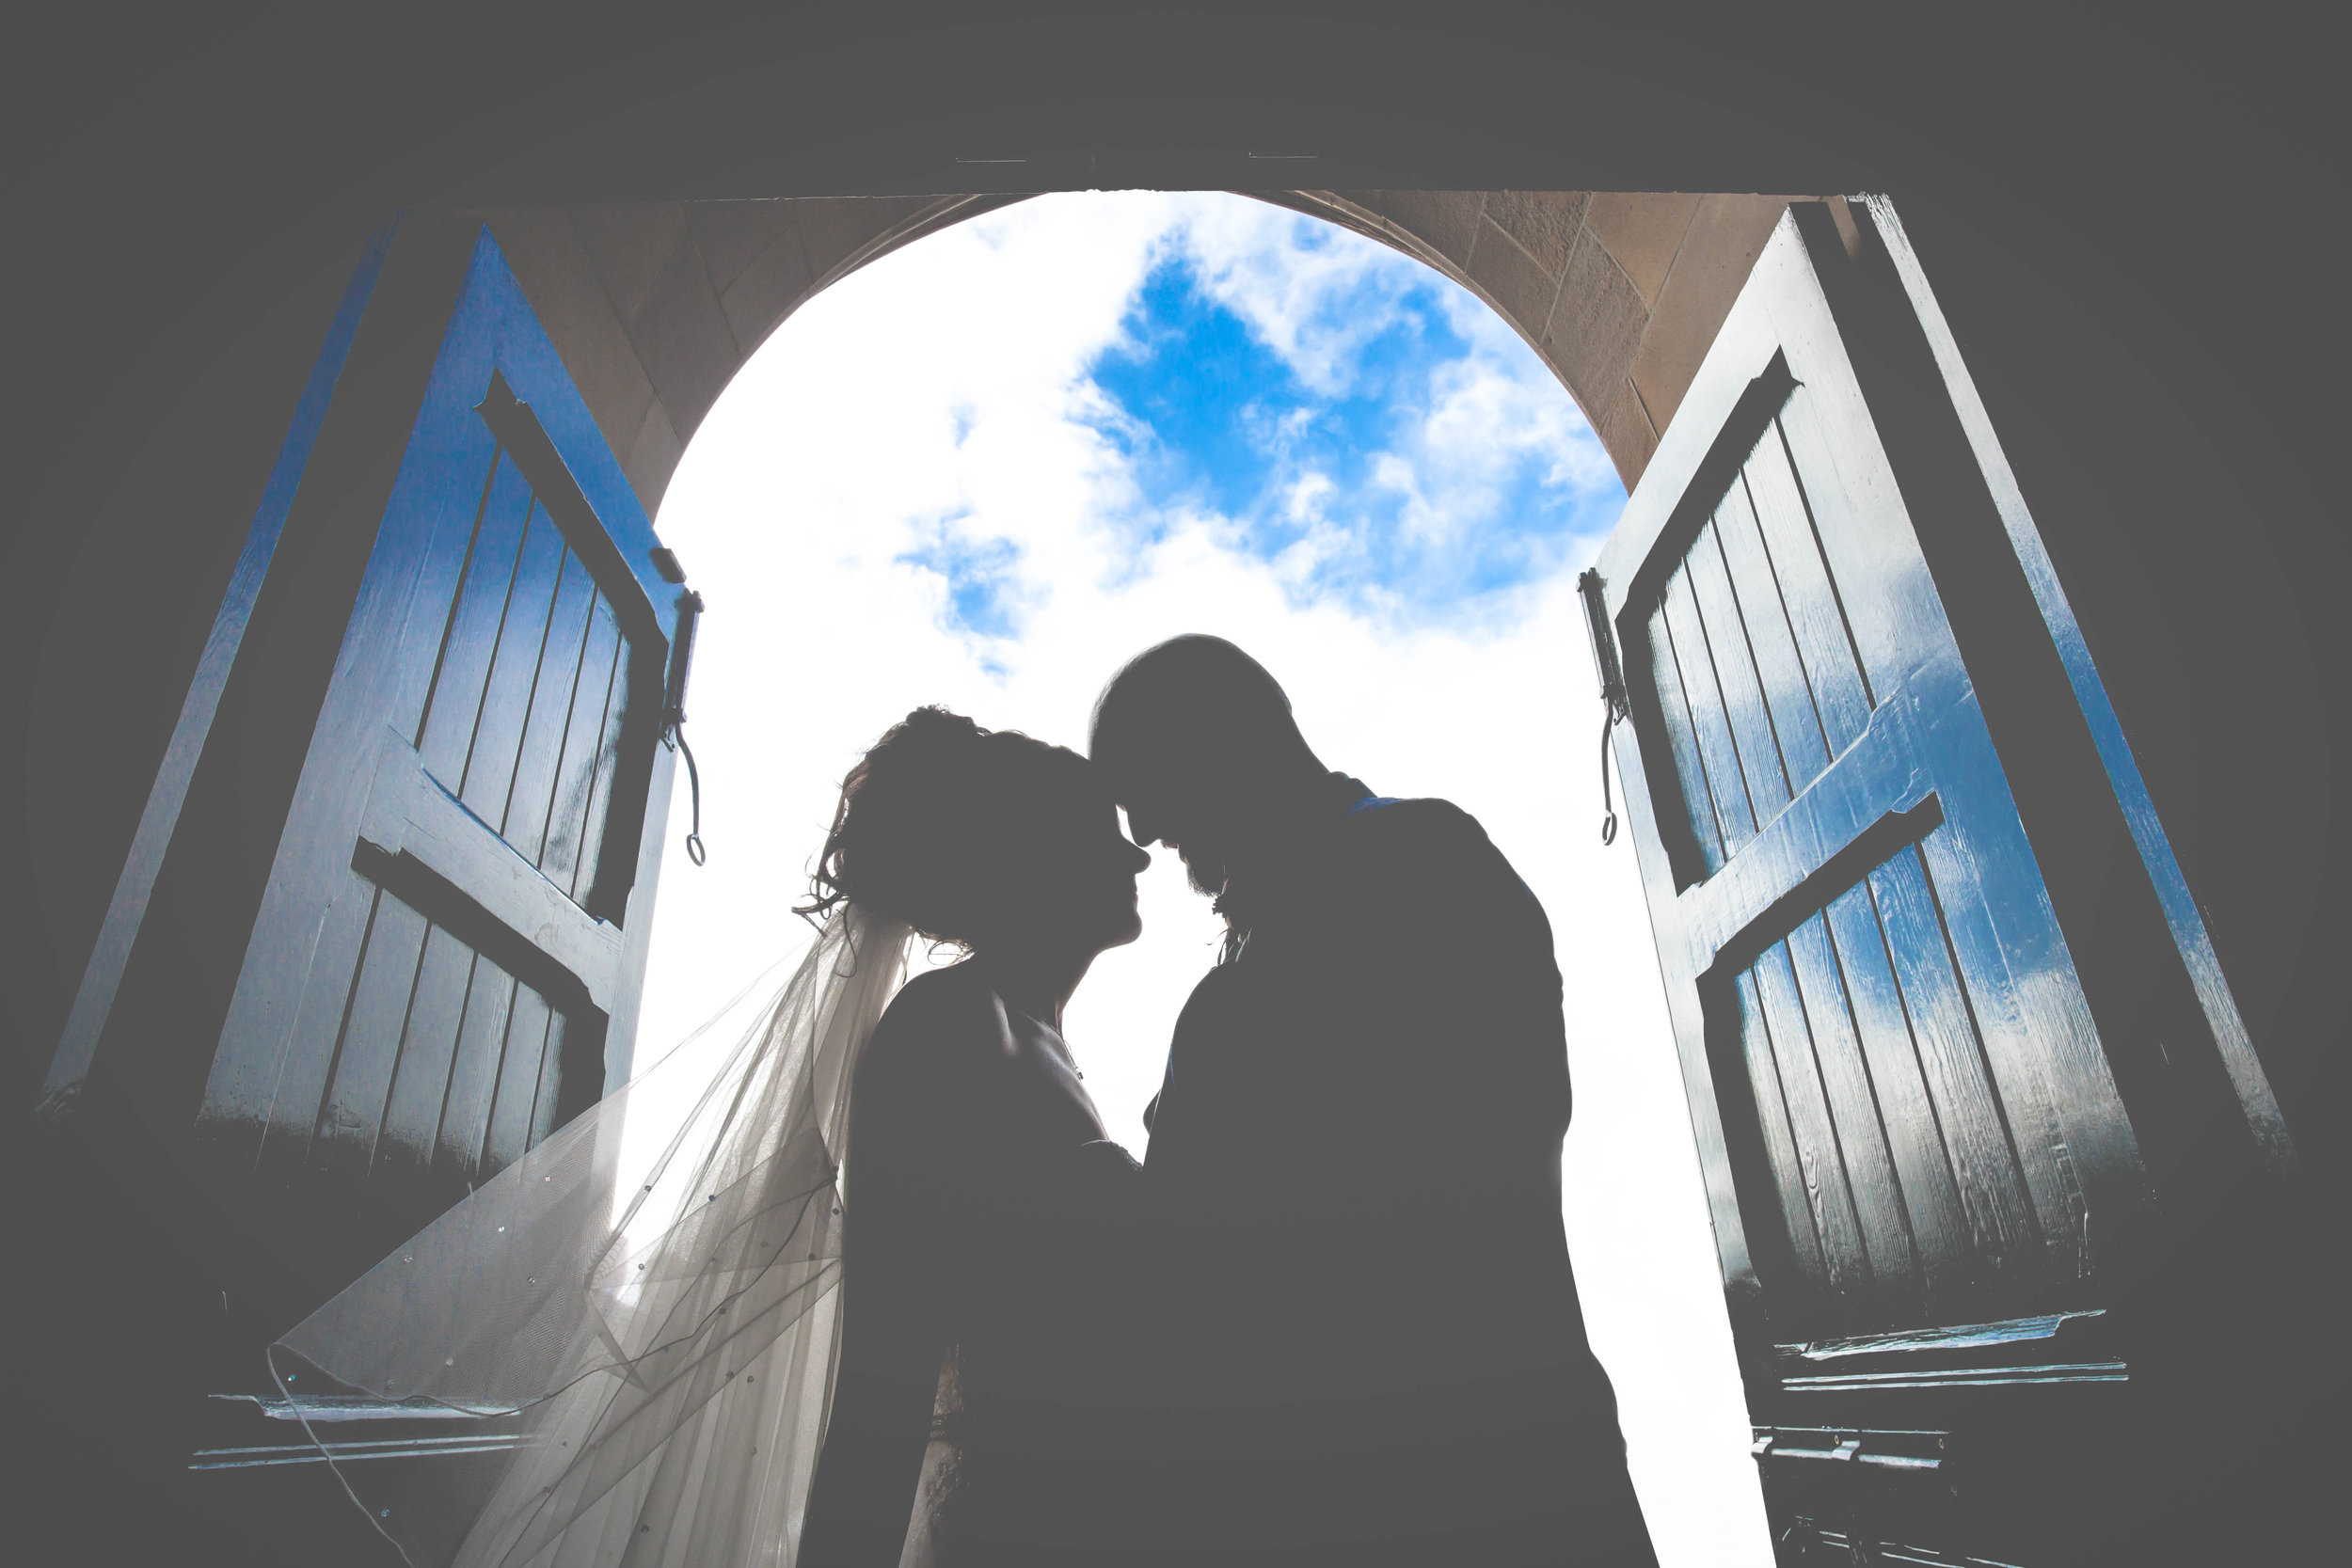 Northern Ireland Wedding Photographer   Brian McEwan Photography   Affordable Wedding Photography Throughout Antrim Down Armagh Tyrone Londonderry Derry Down Fermanagh -43.jpg